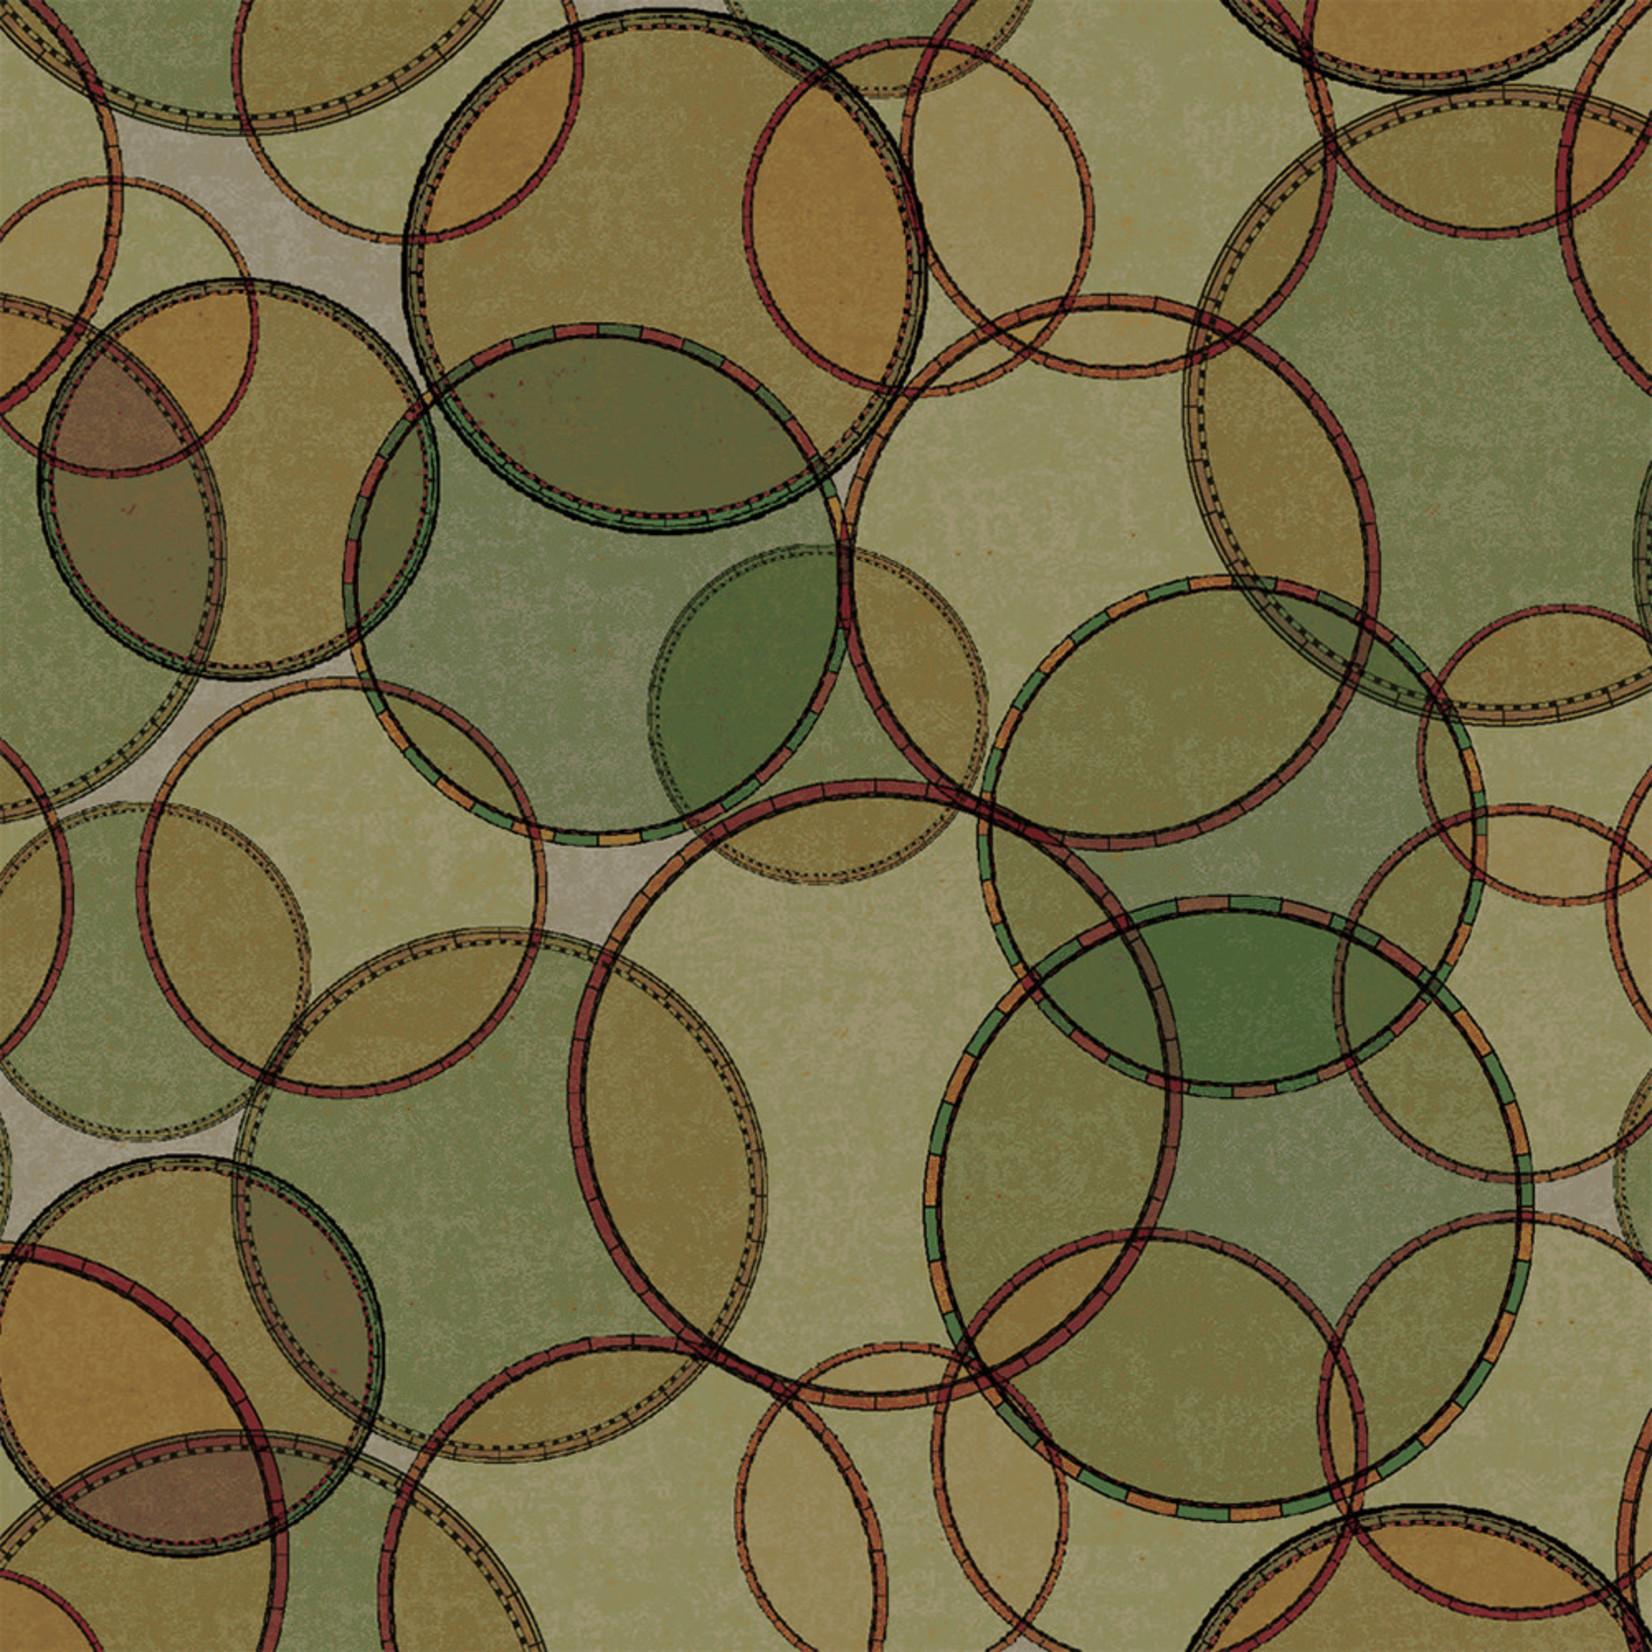 Windham Fabrics Seven Seas - Interlocking Rings - Green